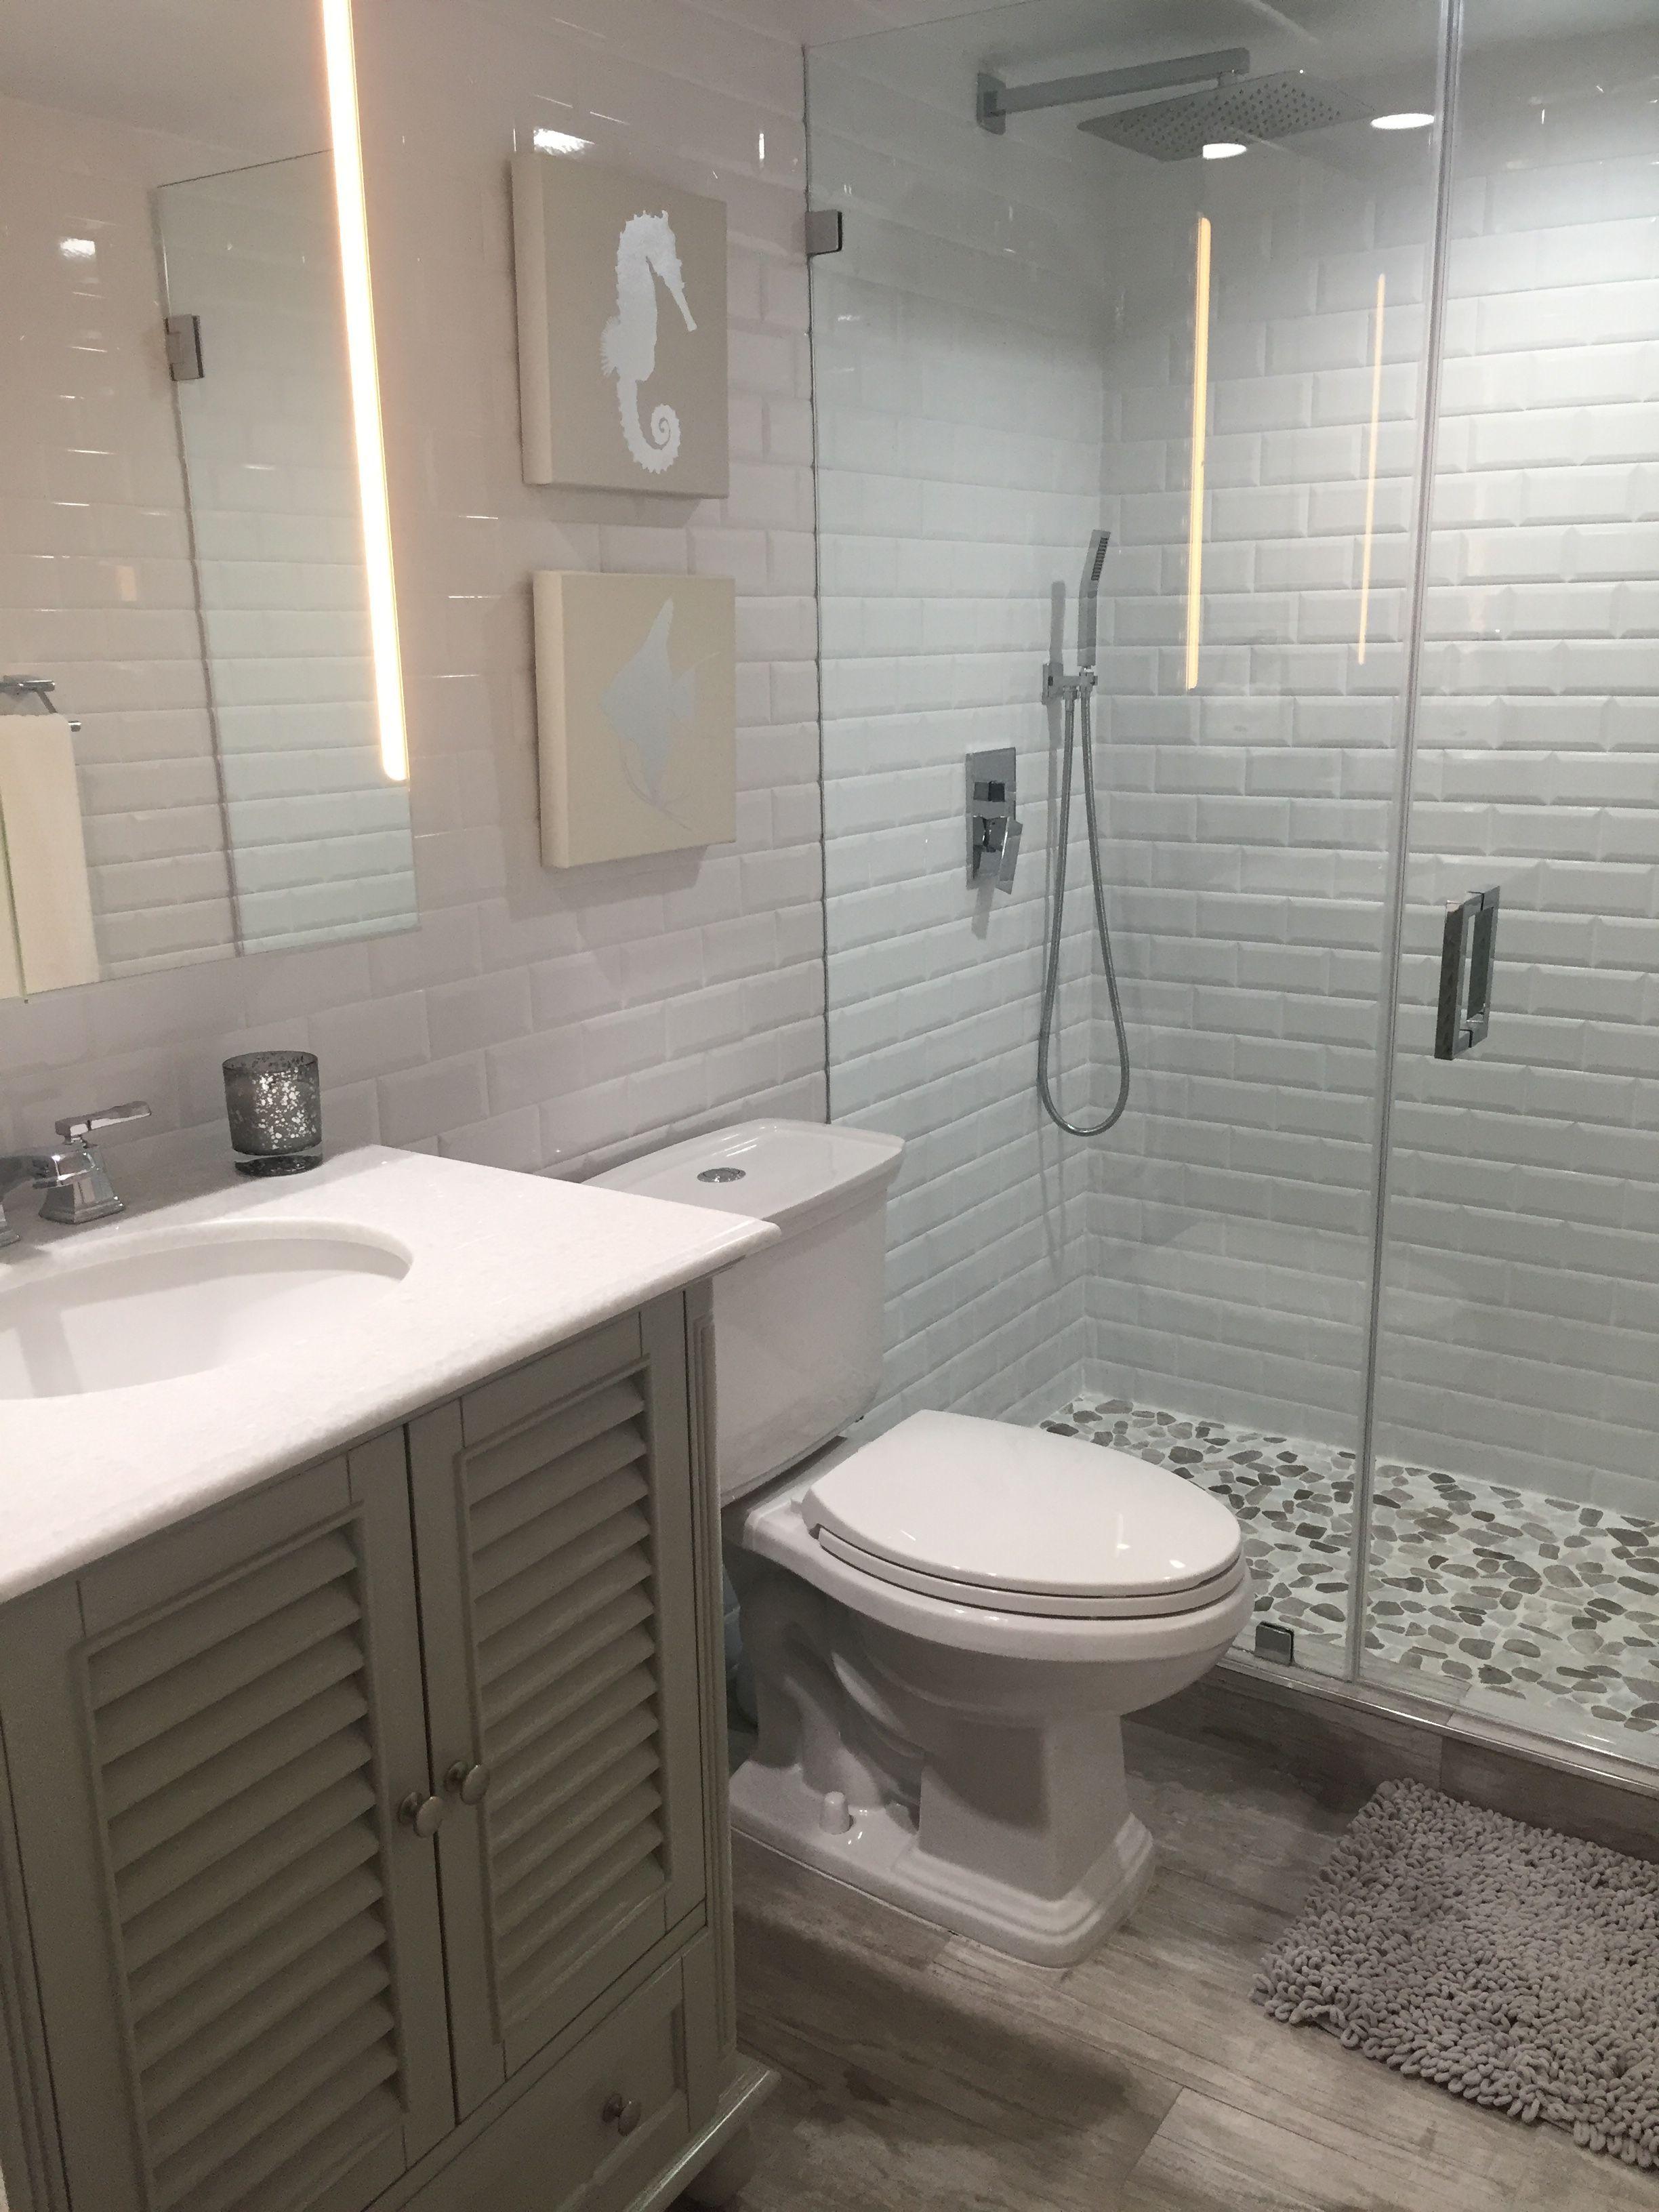 bathroom ideas for small spaces on a budget – eghtesad.info